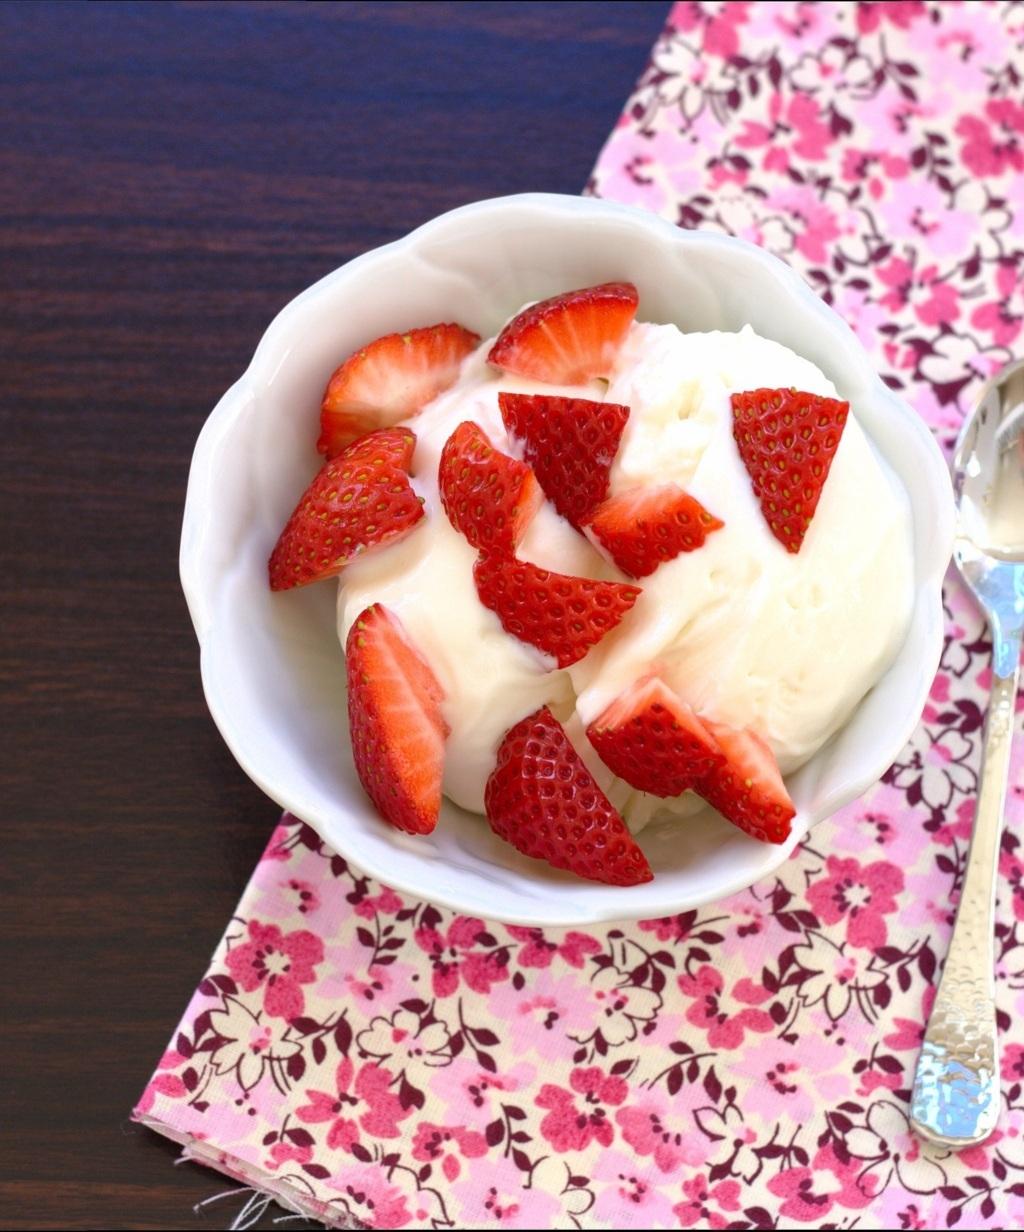 yogurt-ecco-perché -fa-bene